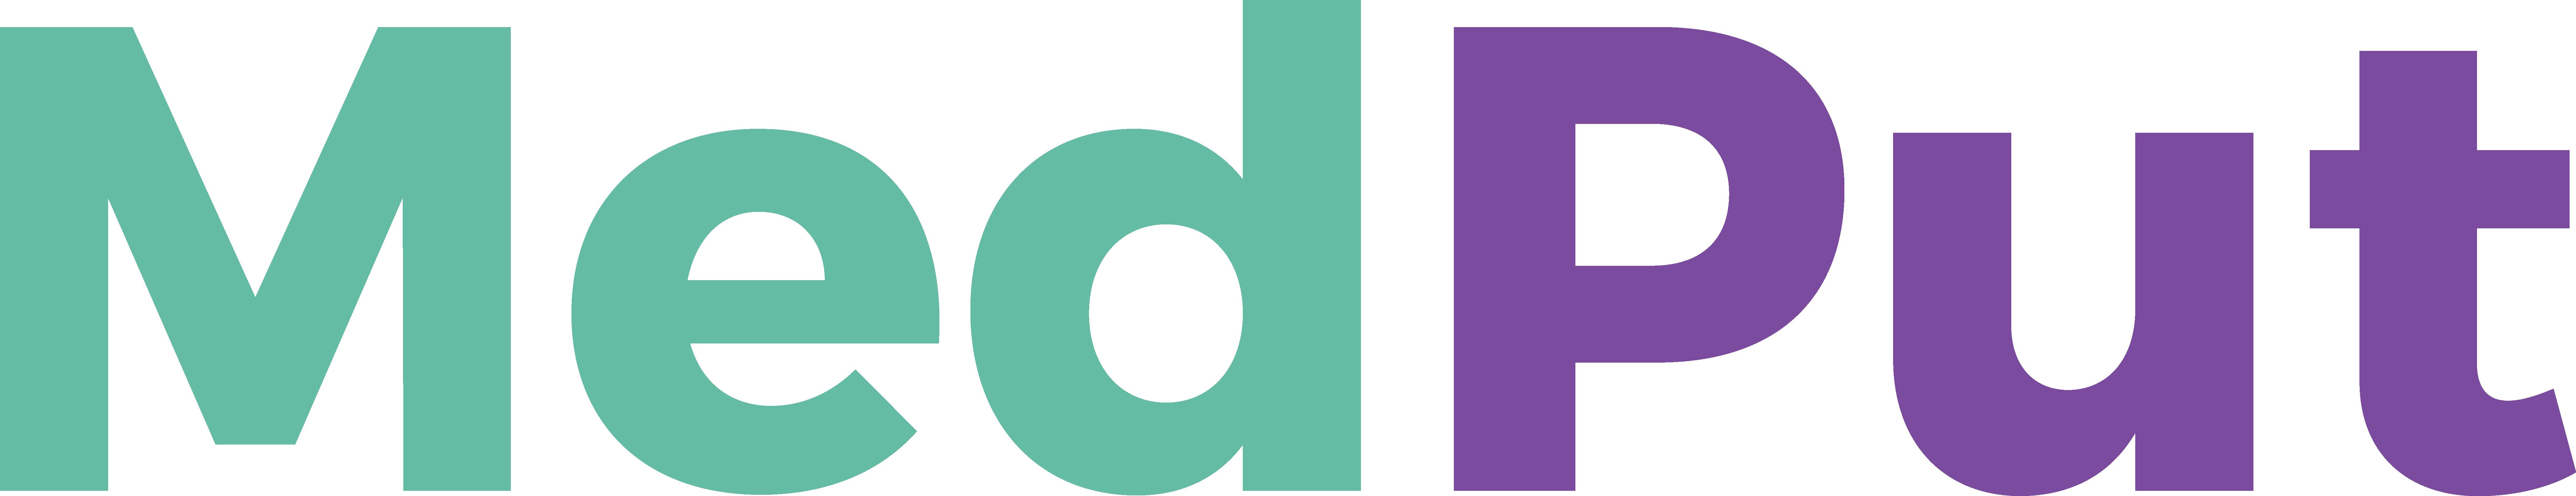 2017 Sponsors and Exhibitors | Employee Benefit Adviser